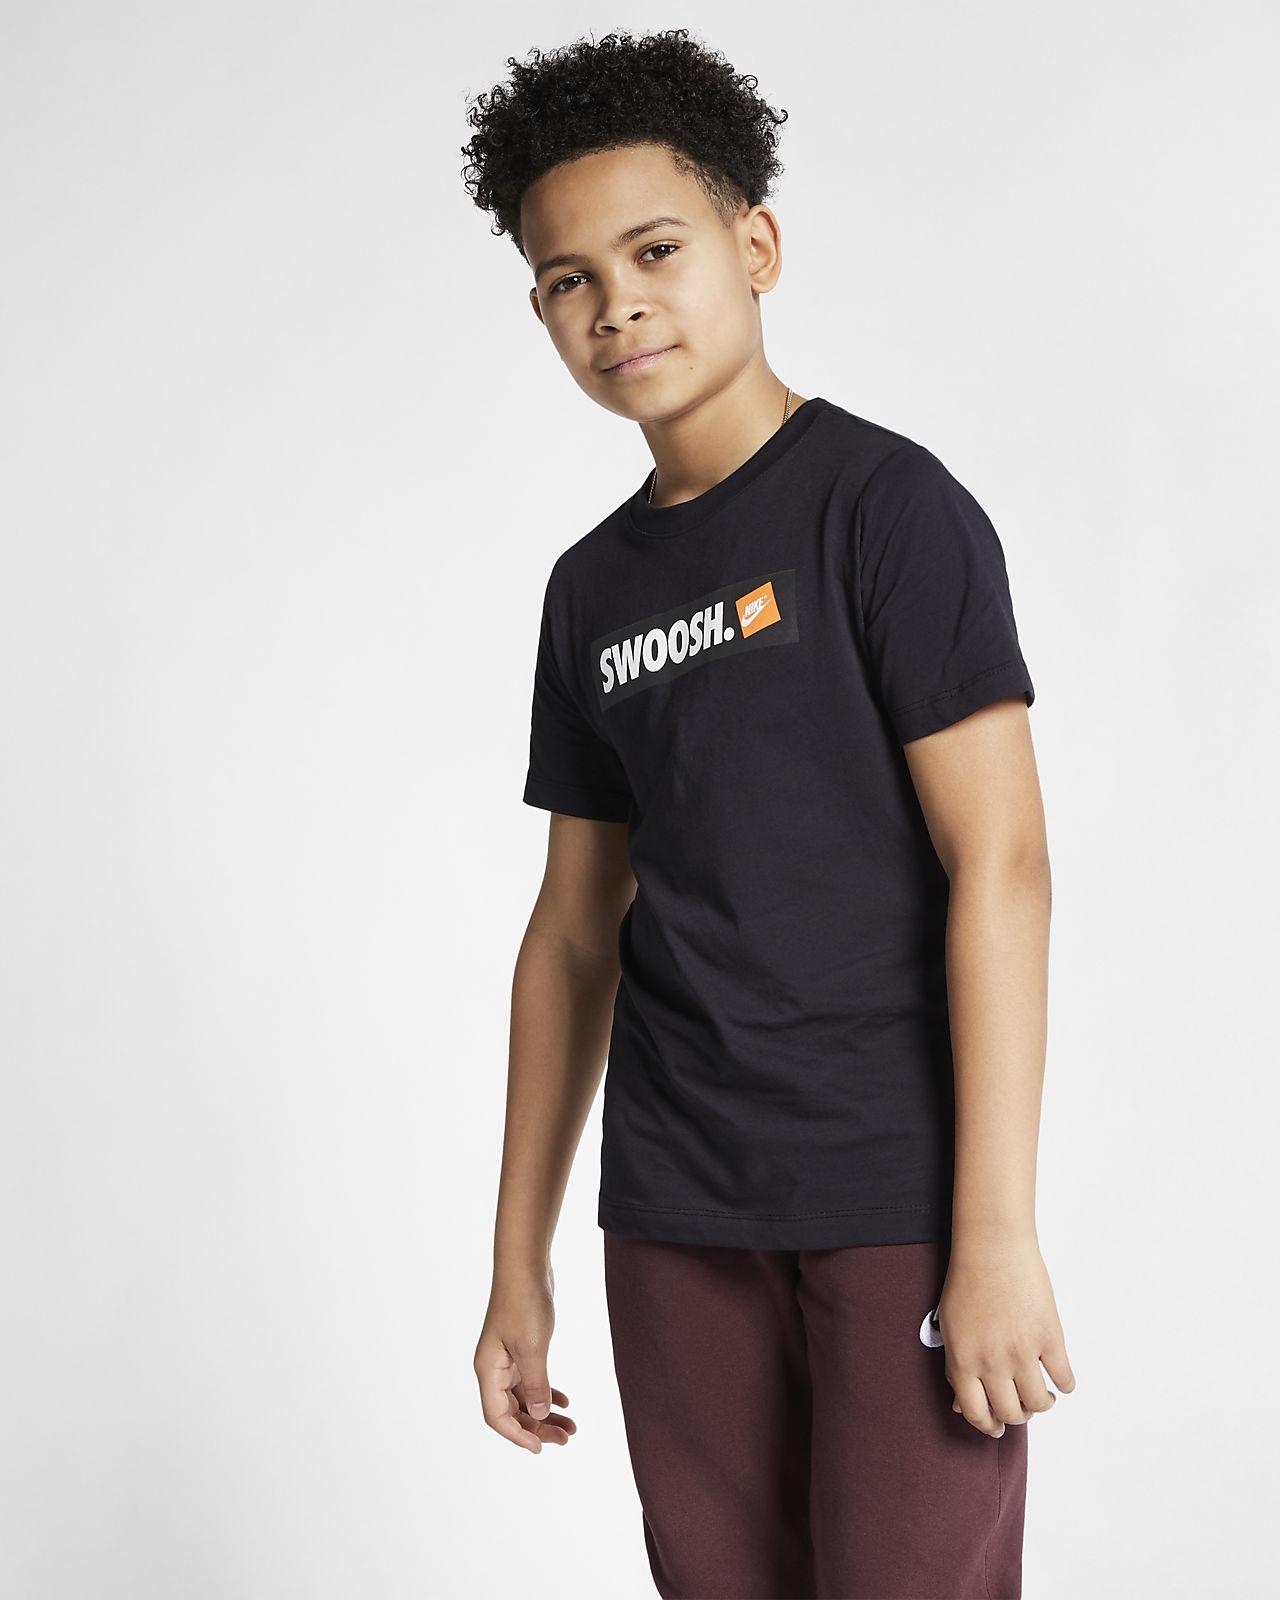 7e3c420a5b9 Nike Sportswear Big Kids  (Boys ) Swoosh T-Shirt. Nike.com